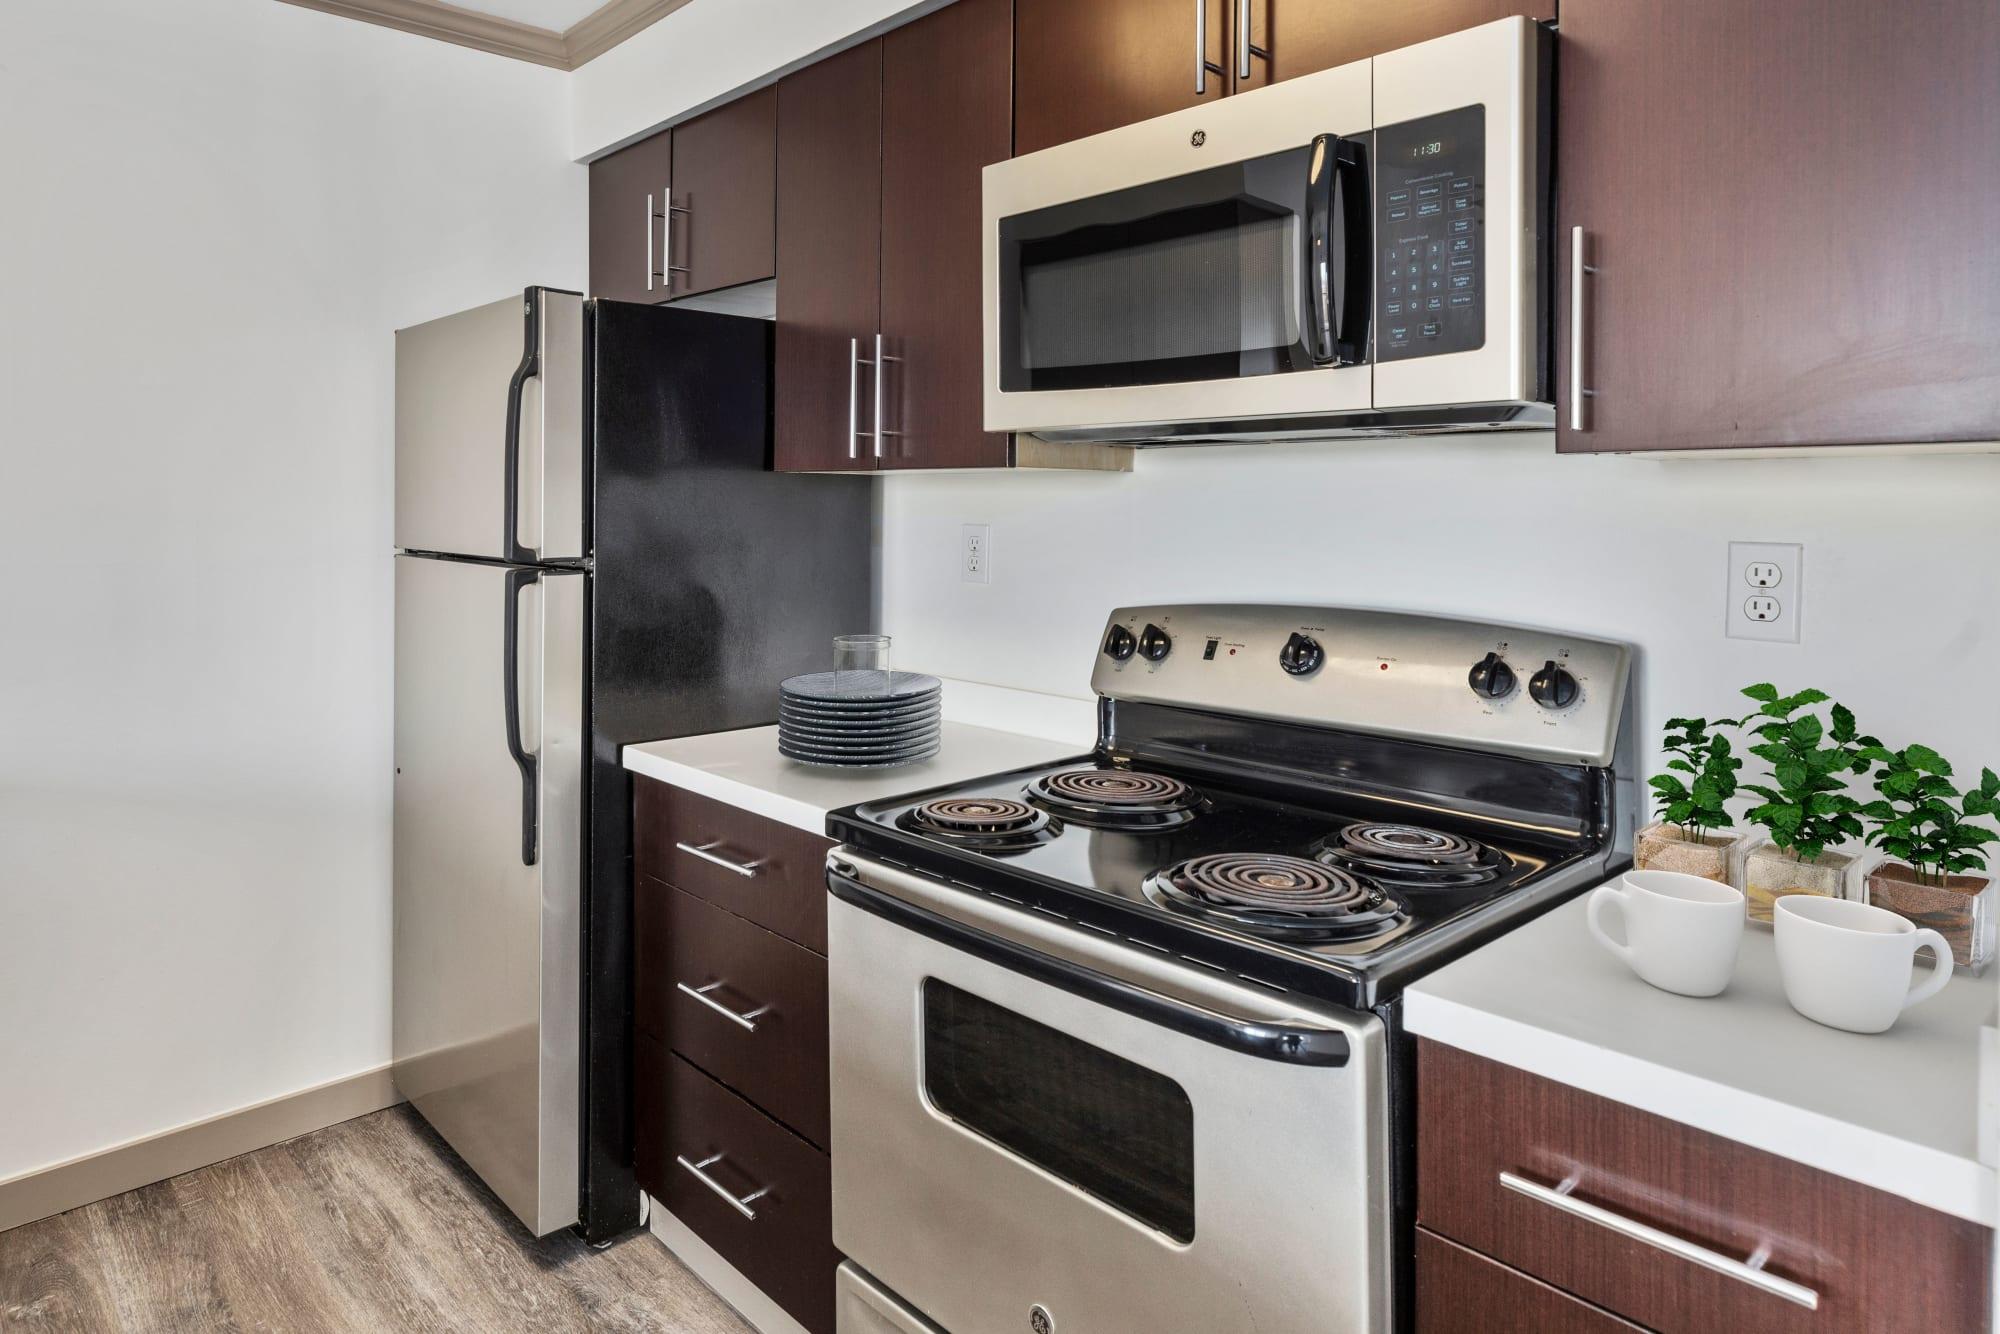 A kitchen with modern stainless appliances at Elan 41 Apartments in Seattle, Washington